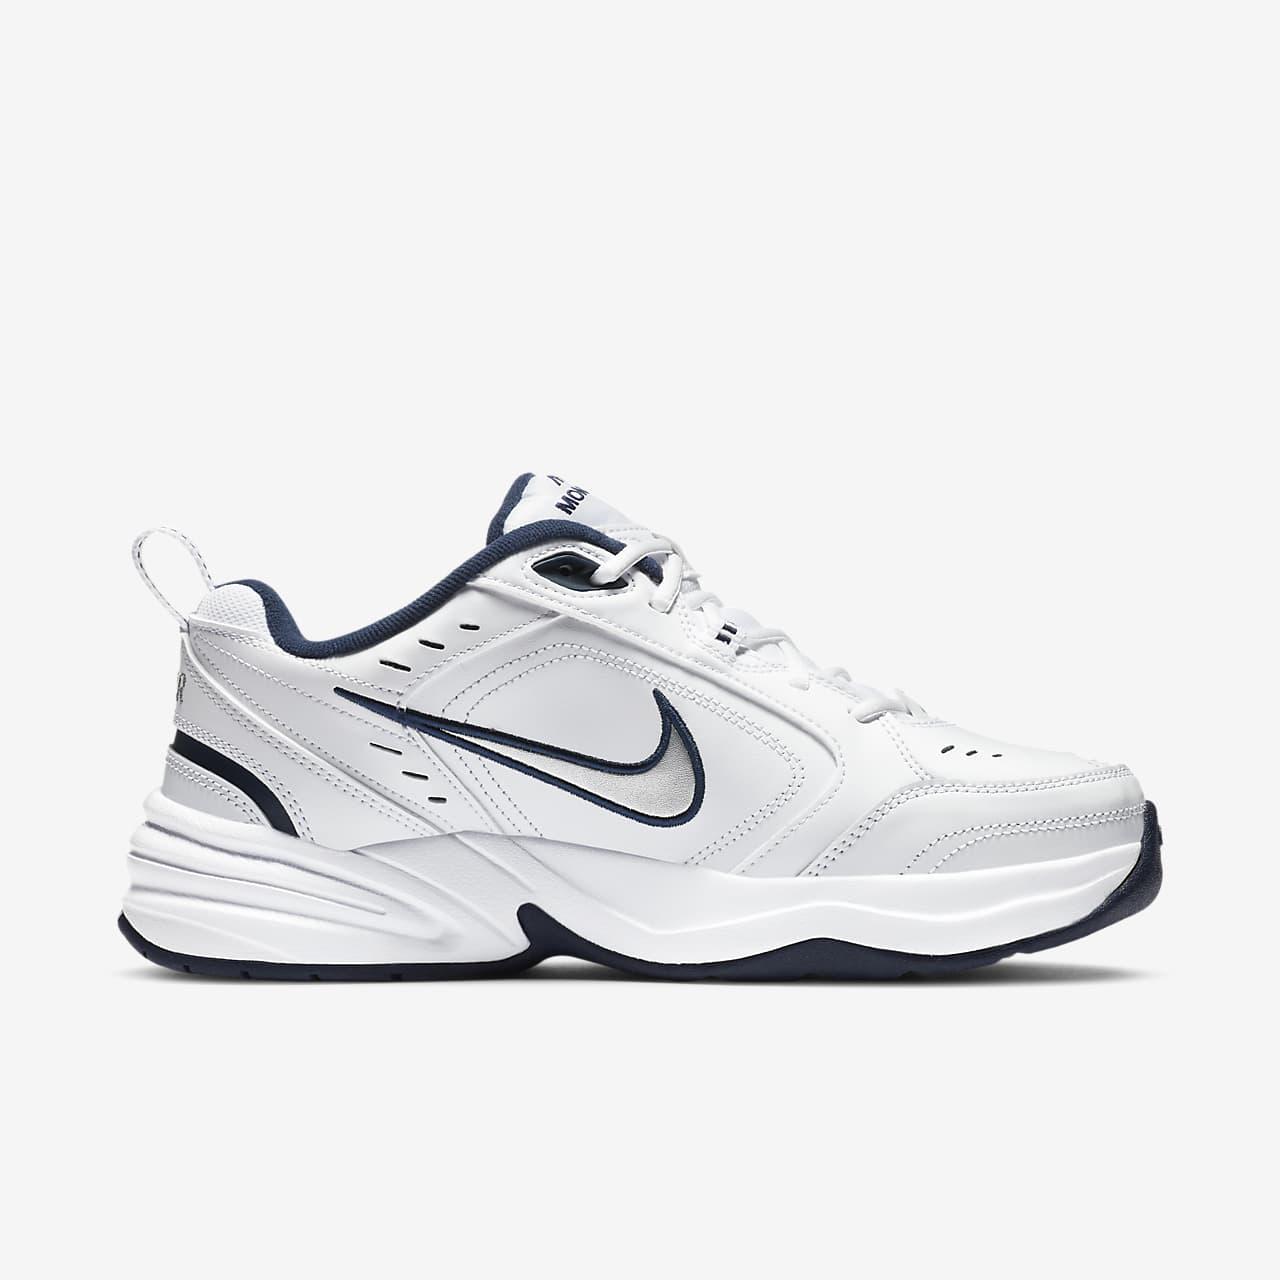 timeless design c7d4b c0b8e ... Nike Air Monarch IV Schuh für Lifestyle Fitnessstudio